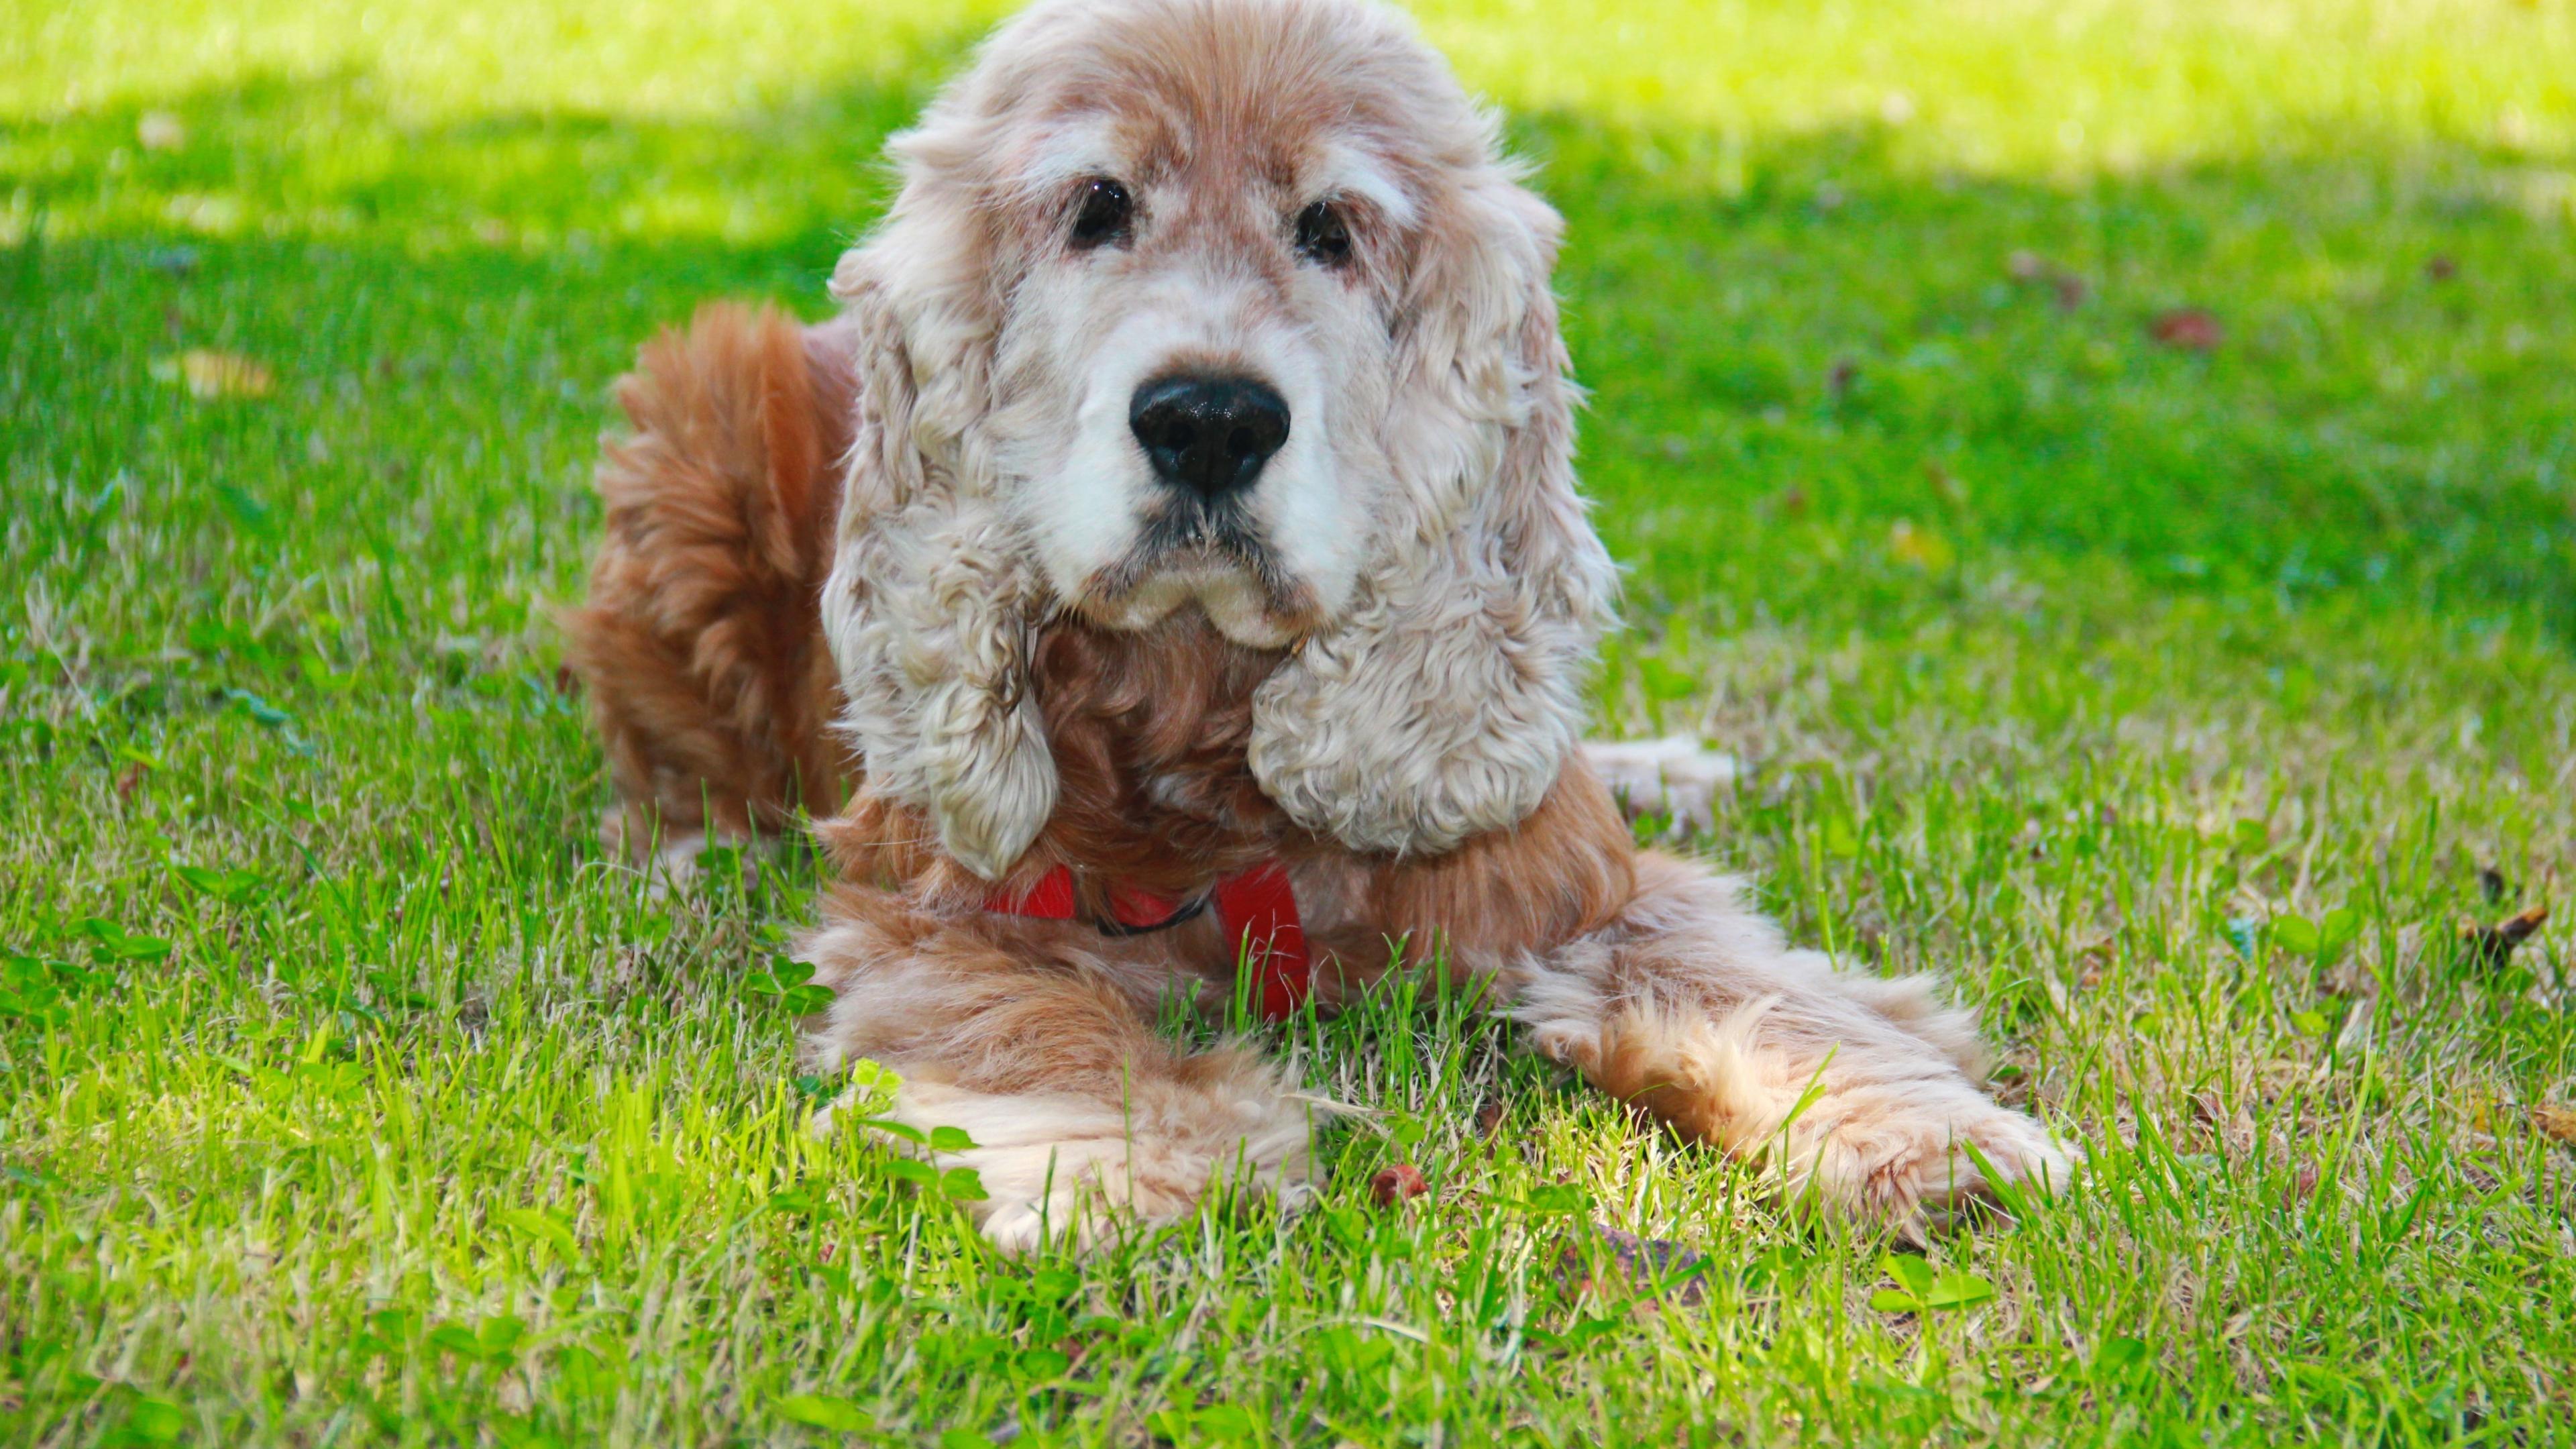 Download 3840x2160 Wallpaper Cute Dog Cocker Spaniel 5k 4 K Uhd